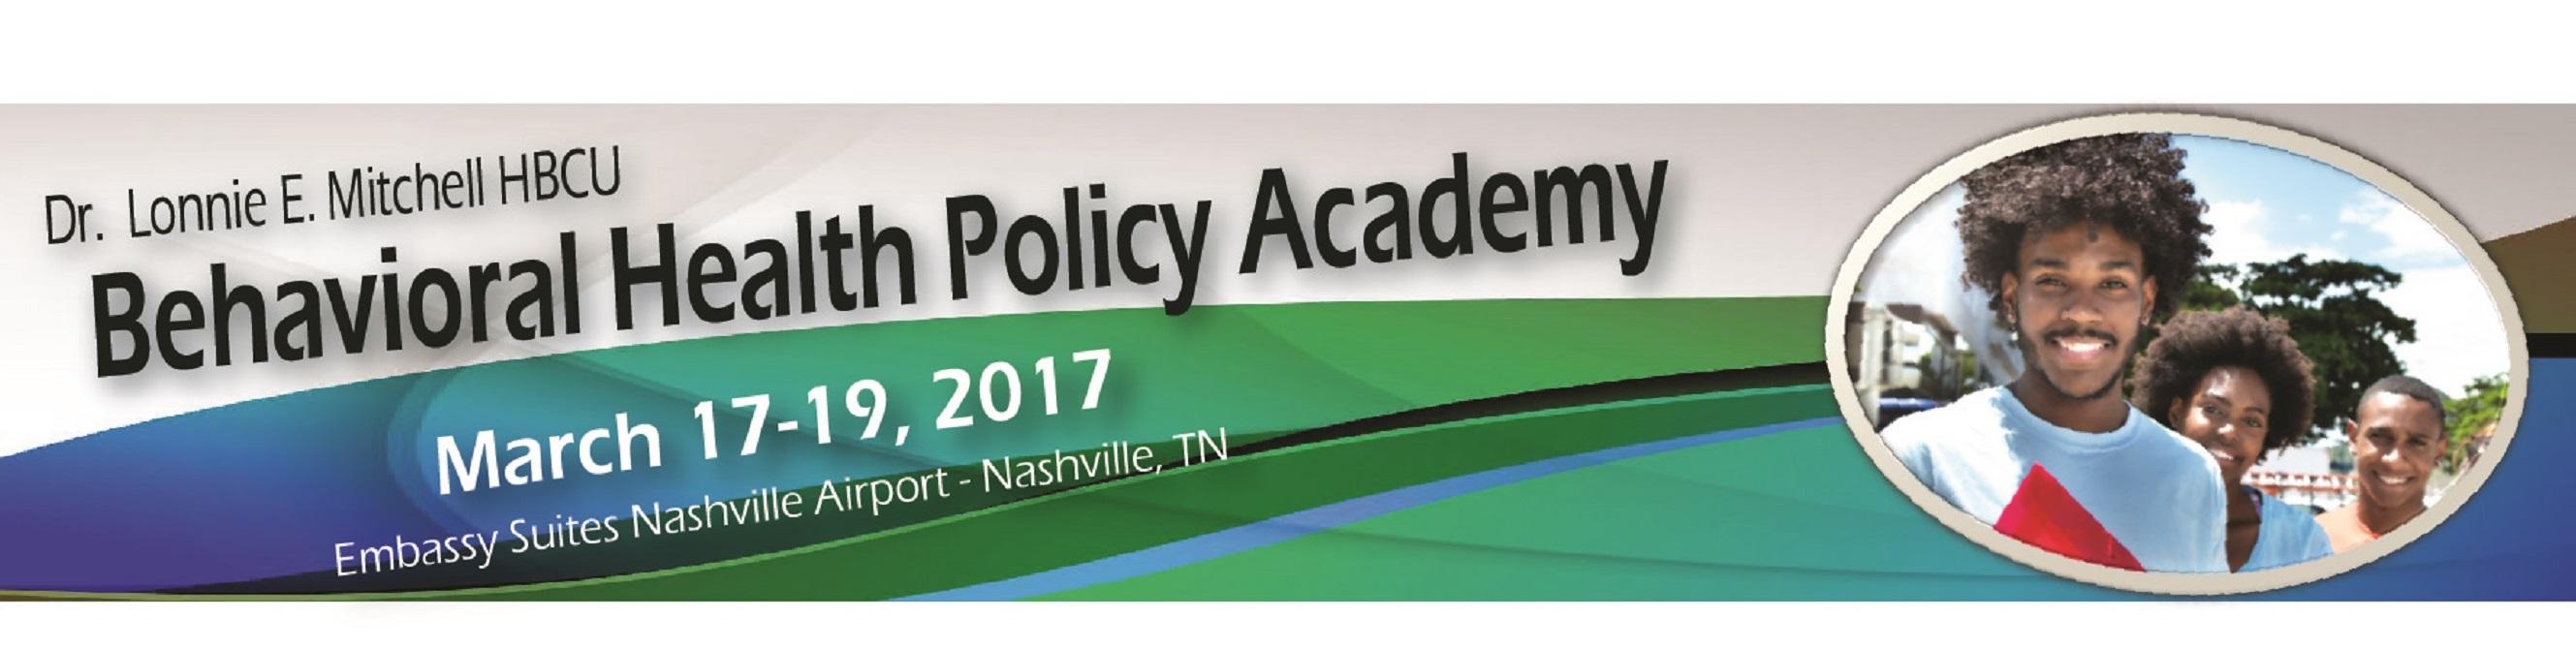 Dr. Lonnie E. Mitchell HBCU Behavioral Health Policy Academy